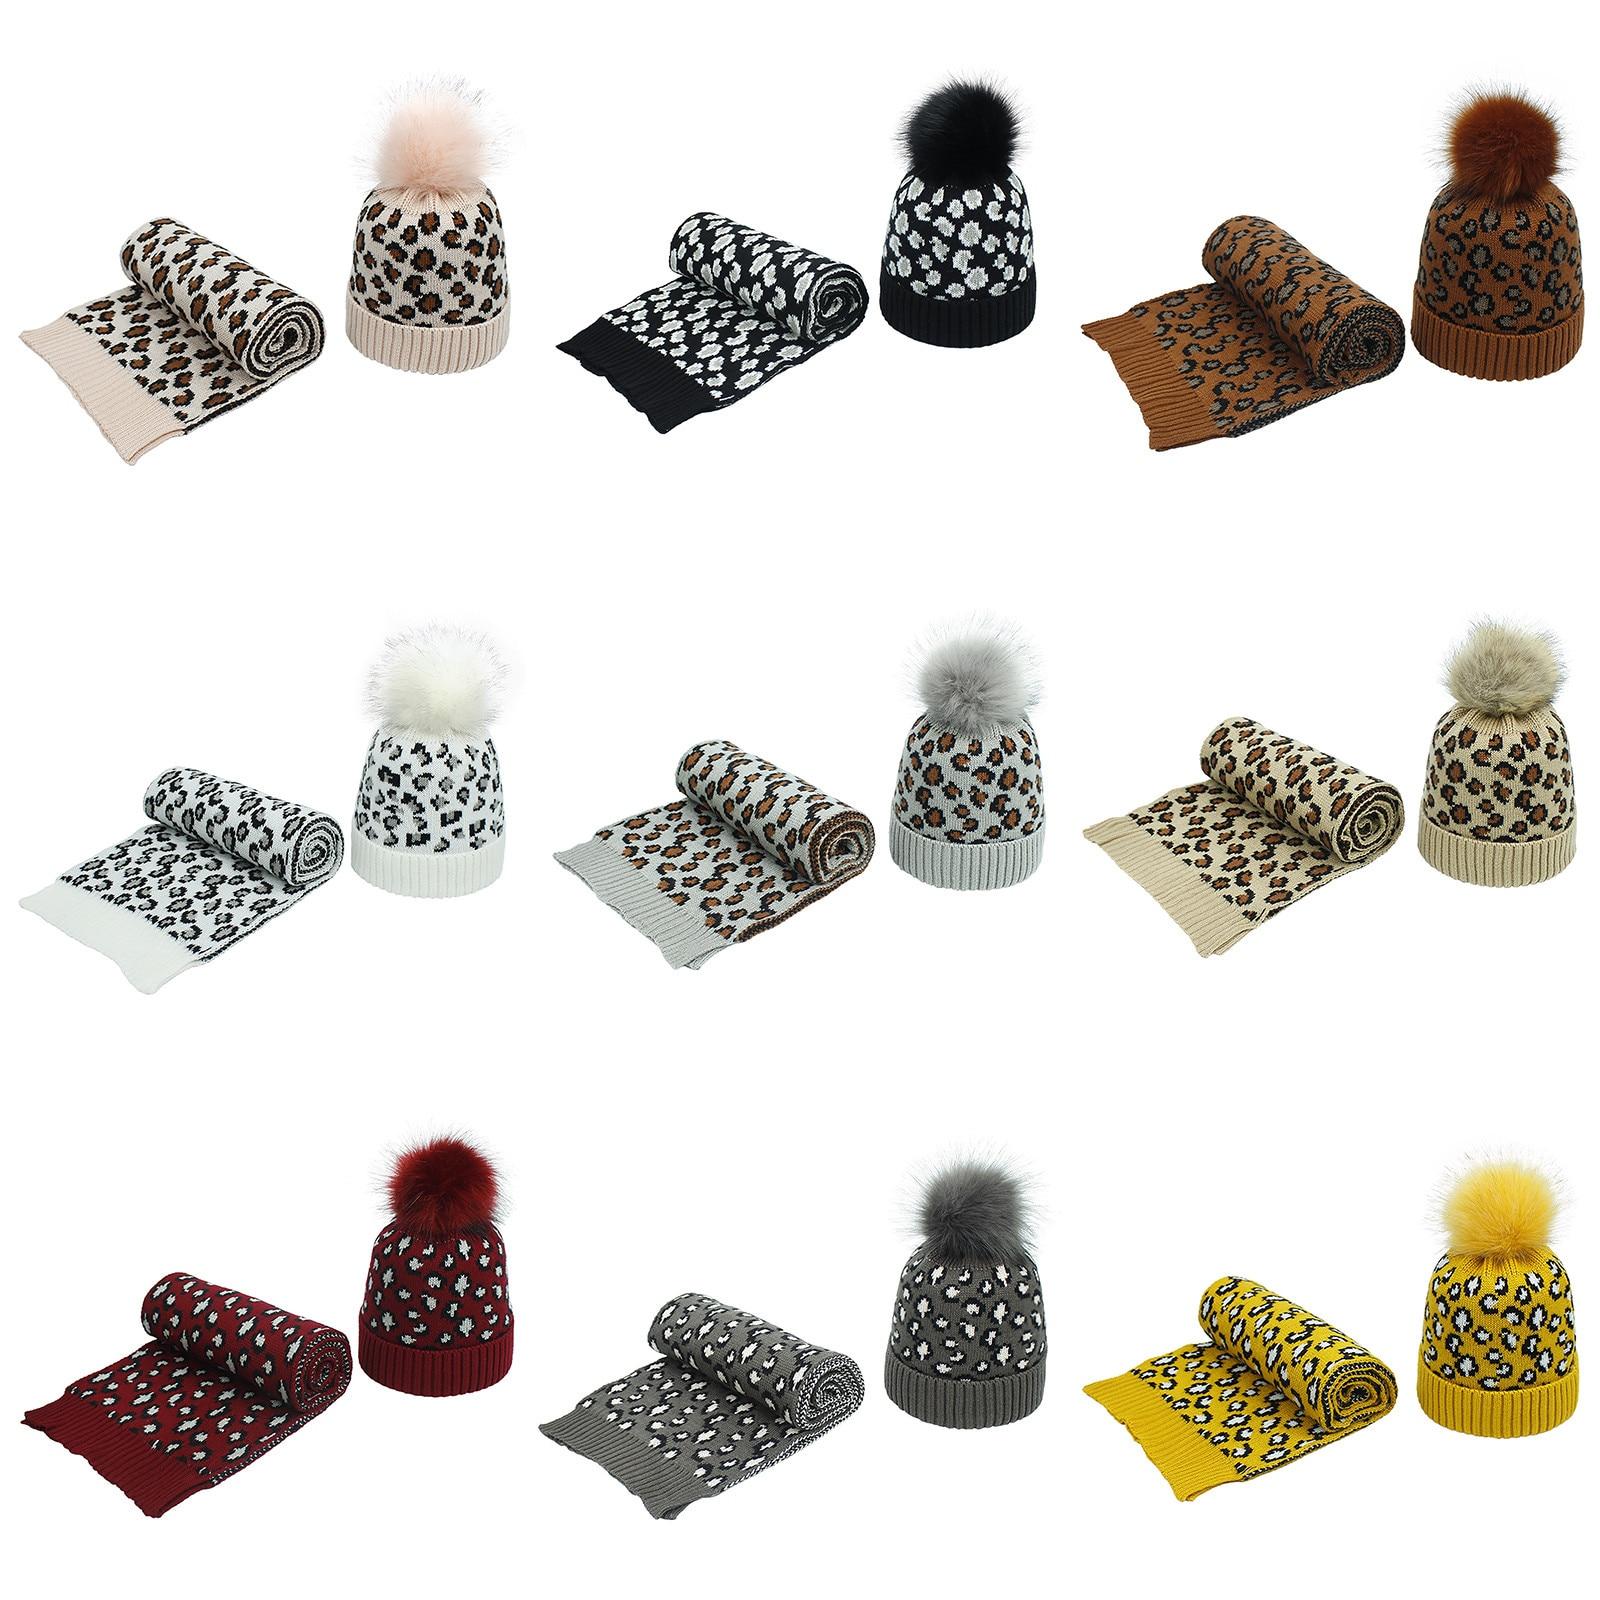 Winter Scarf Set Woman Men's Scarves Unisex Winter Scarf Luxury Brand Neckerchief Knitted Warm Scarf Hat Two-piece Set echarpe